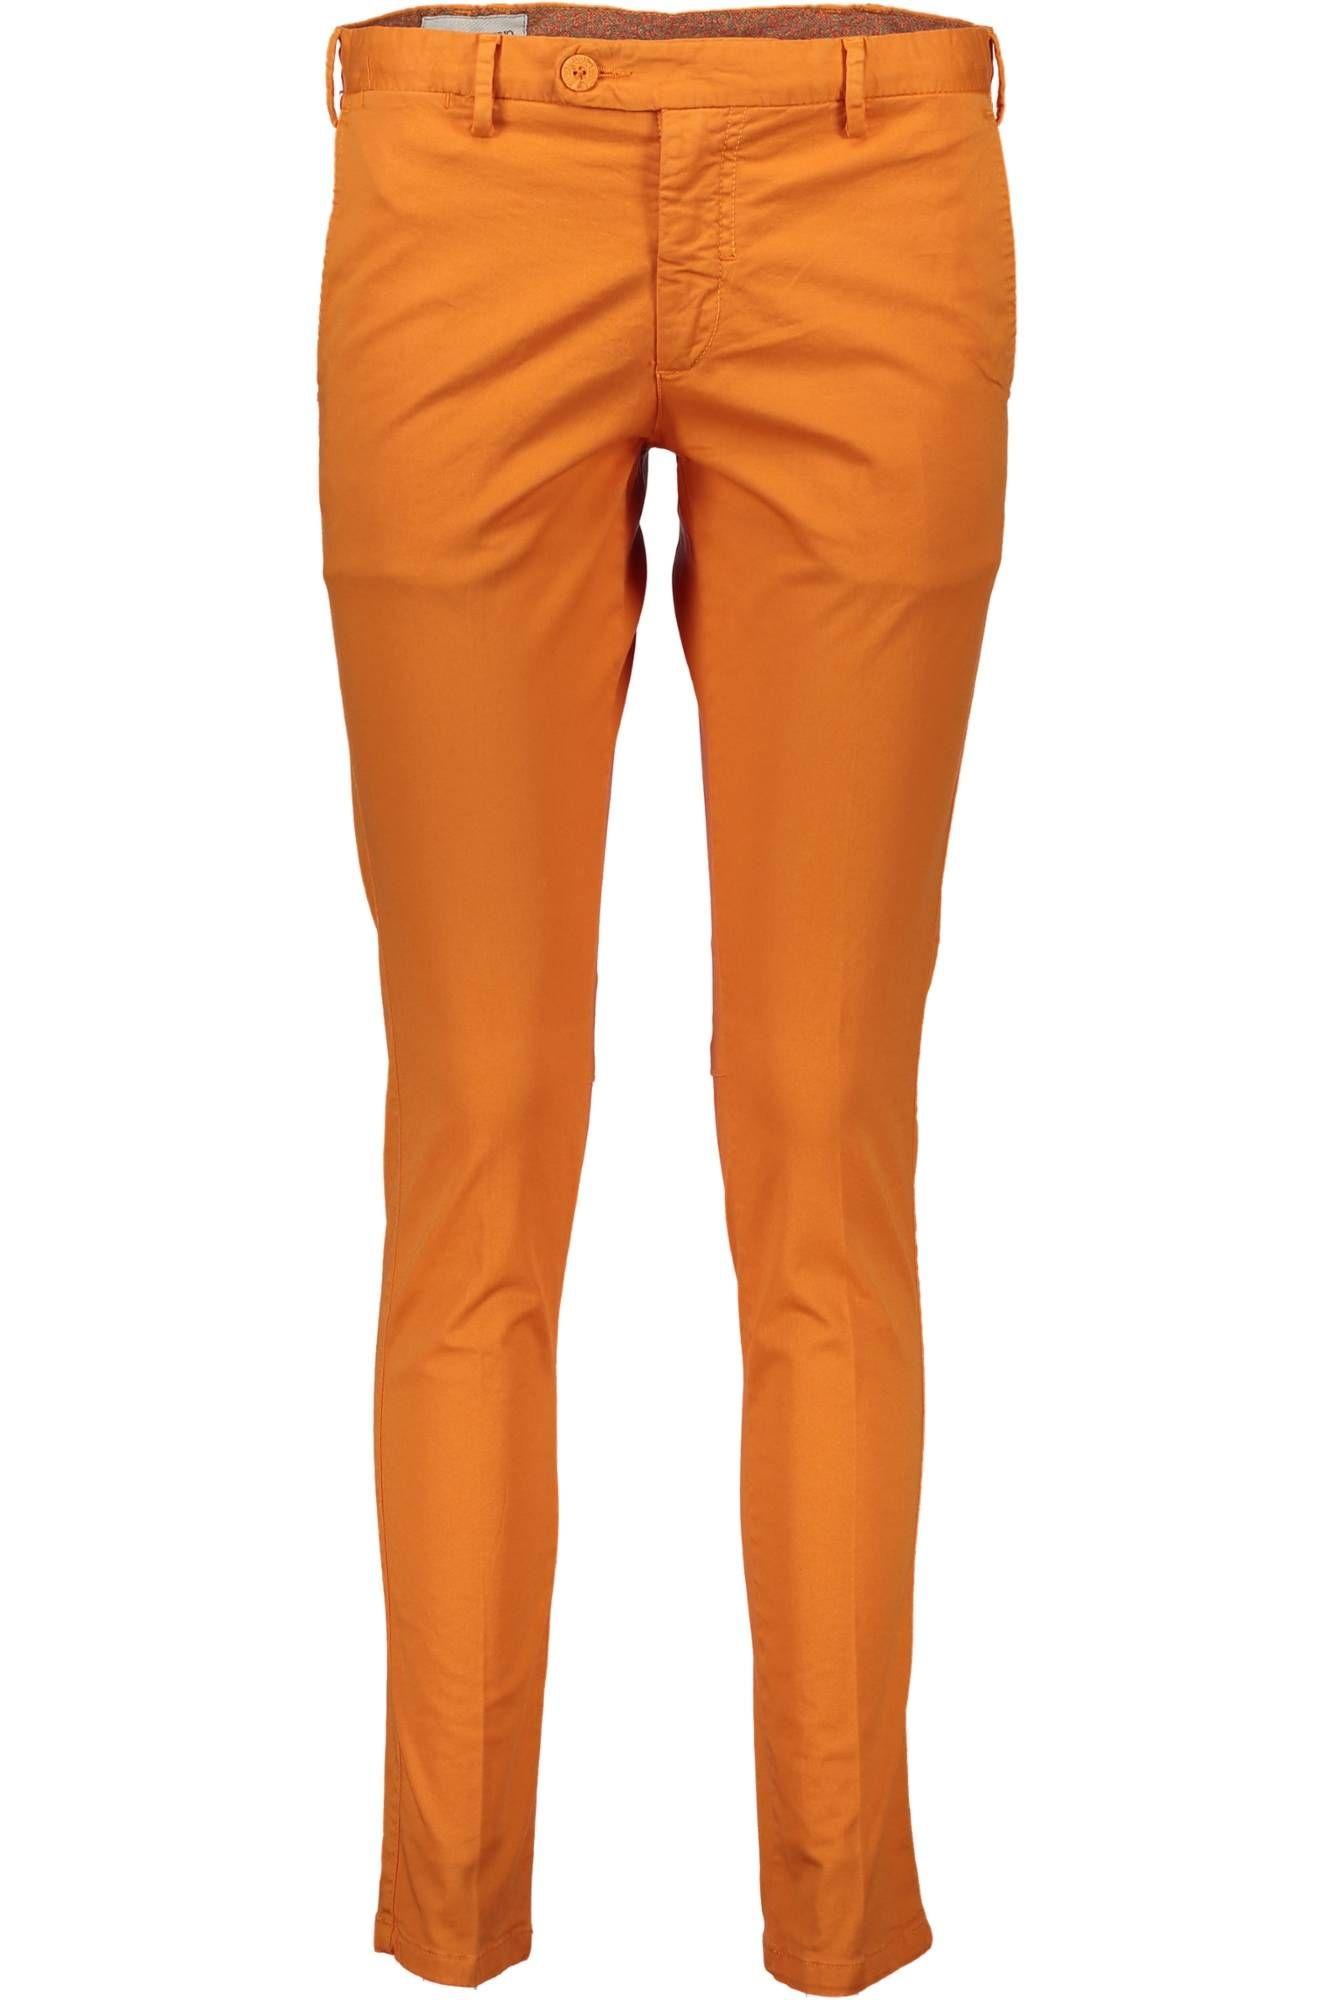 Kalhoty PRIMO EMPORIO kalhoty ARANCIO